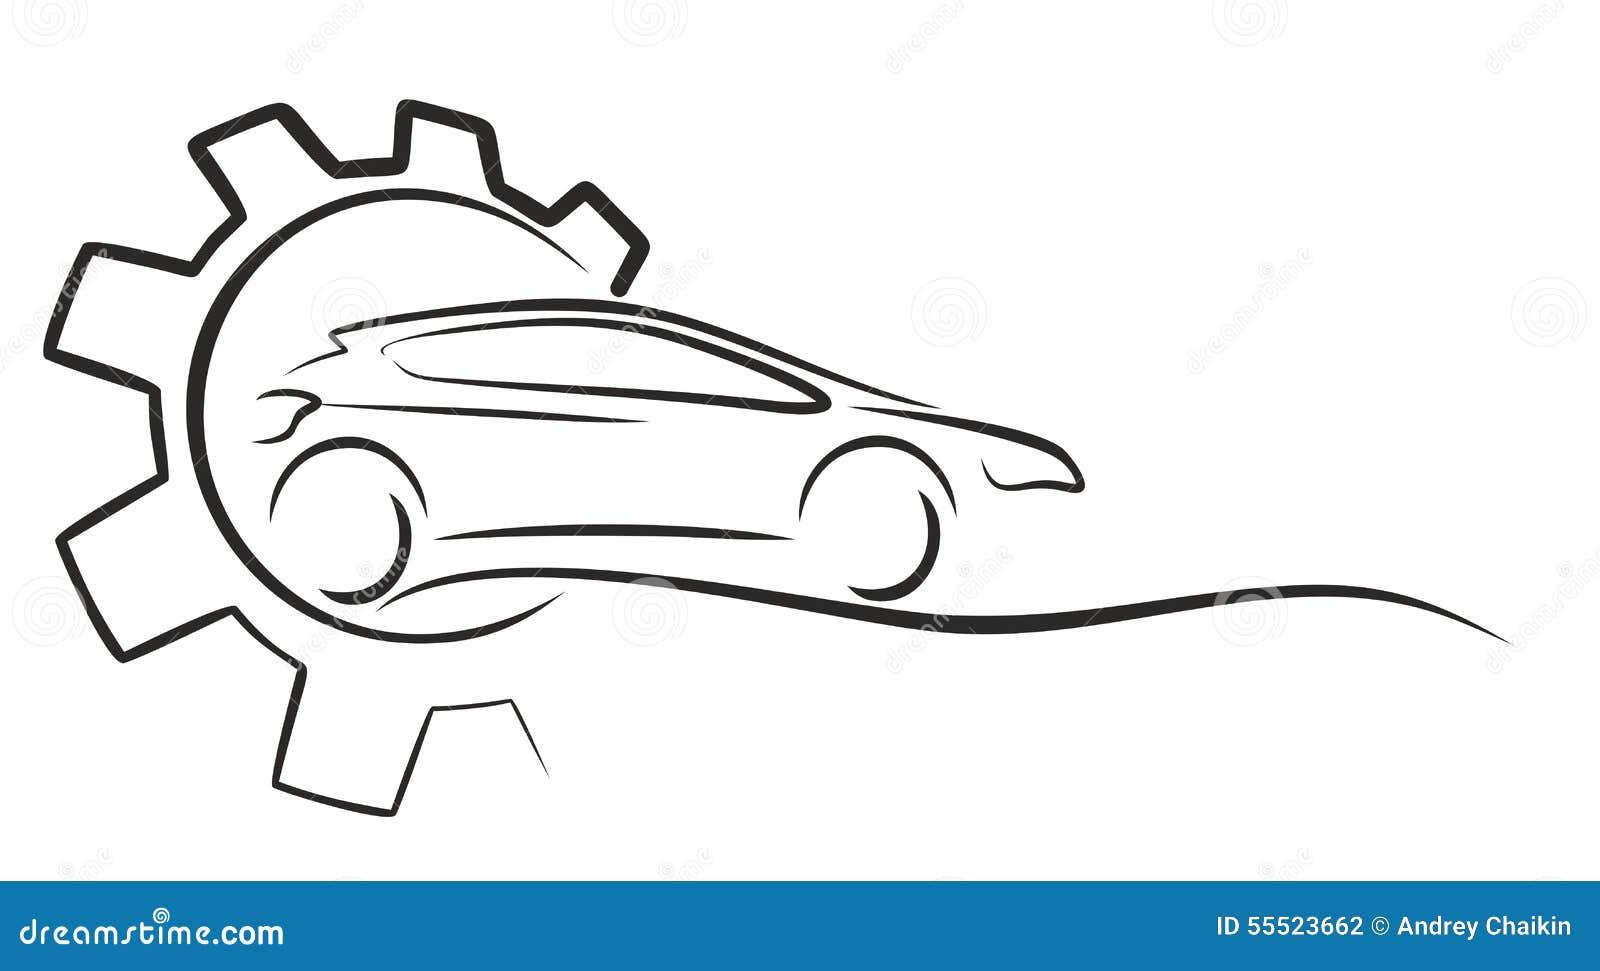 car service logo vector illustration